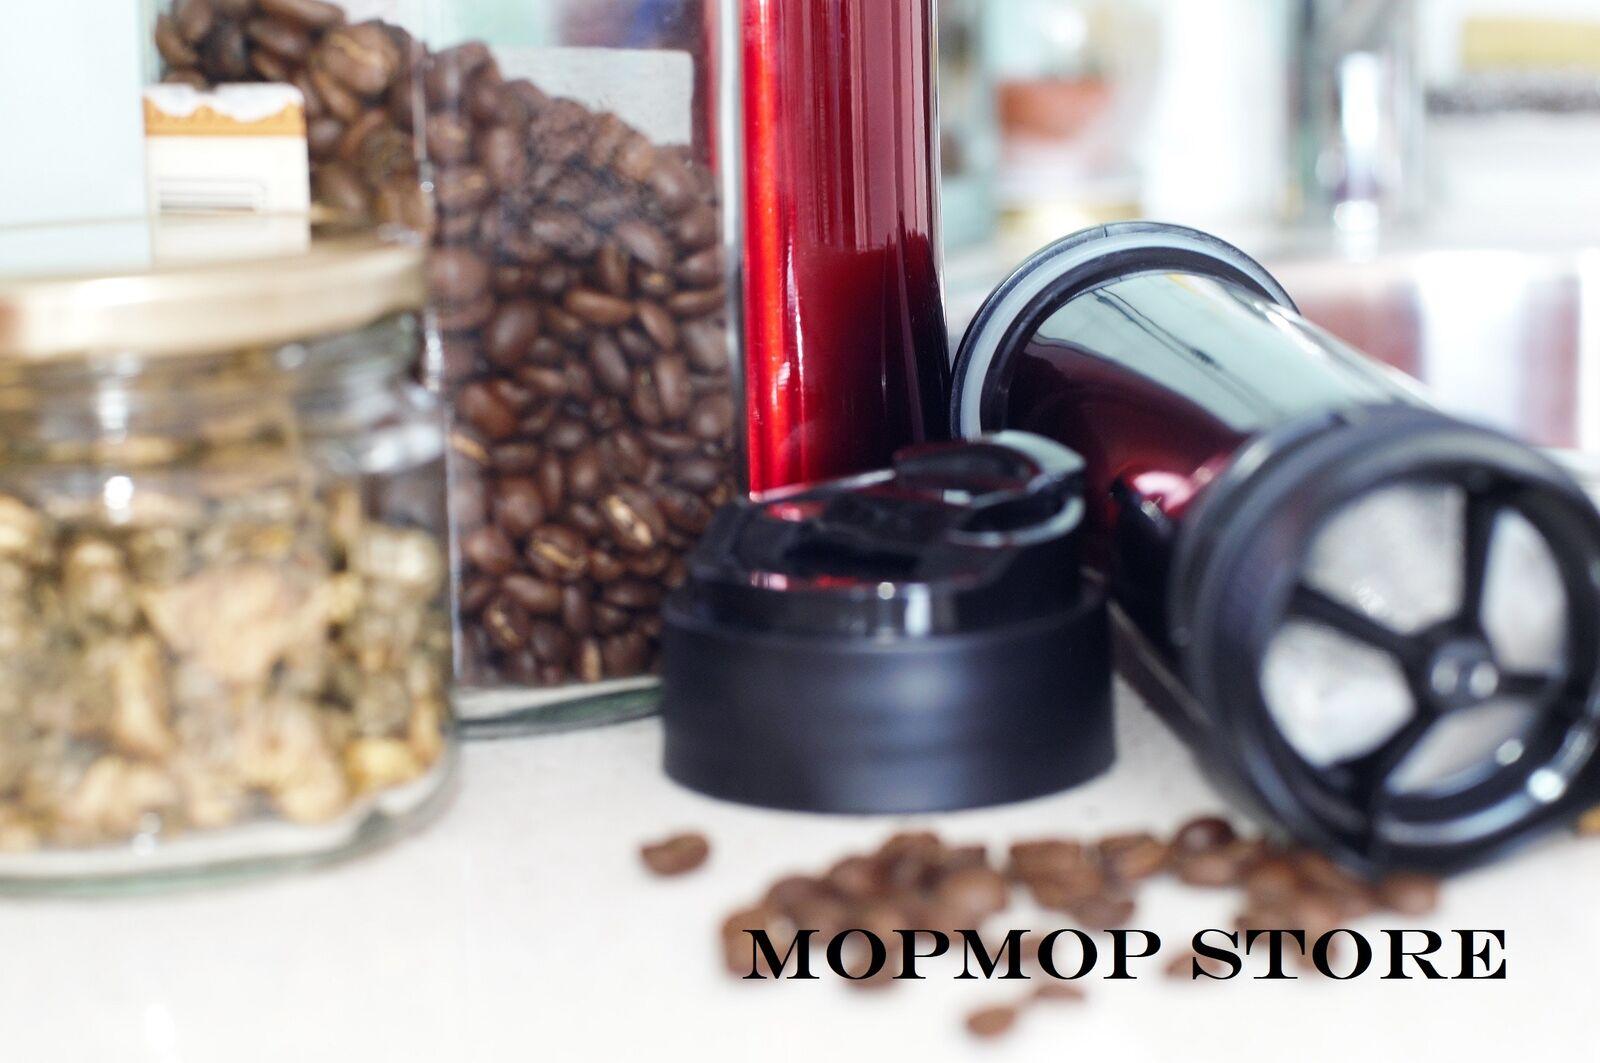 mopmopstore